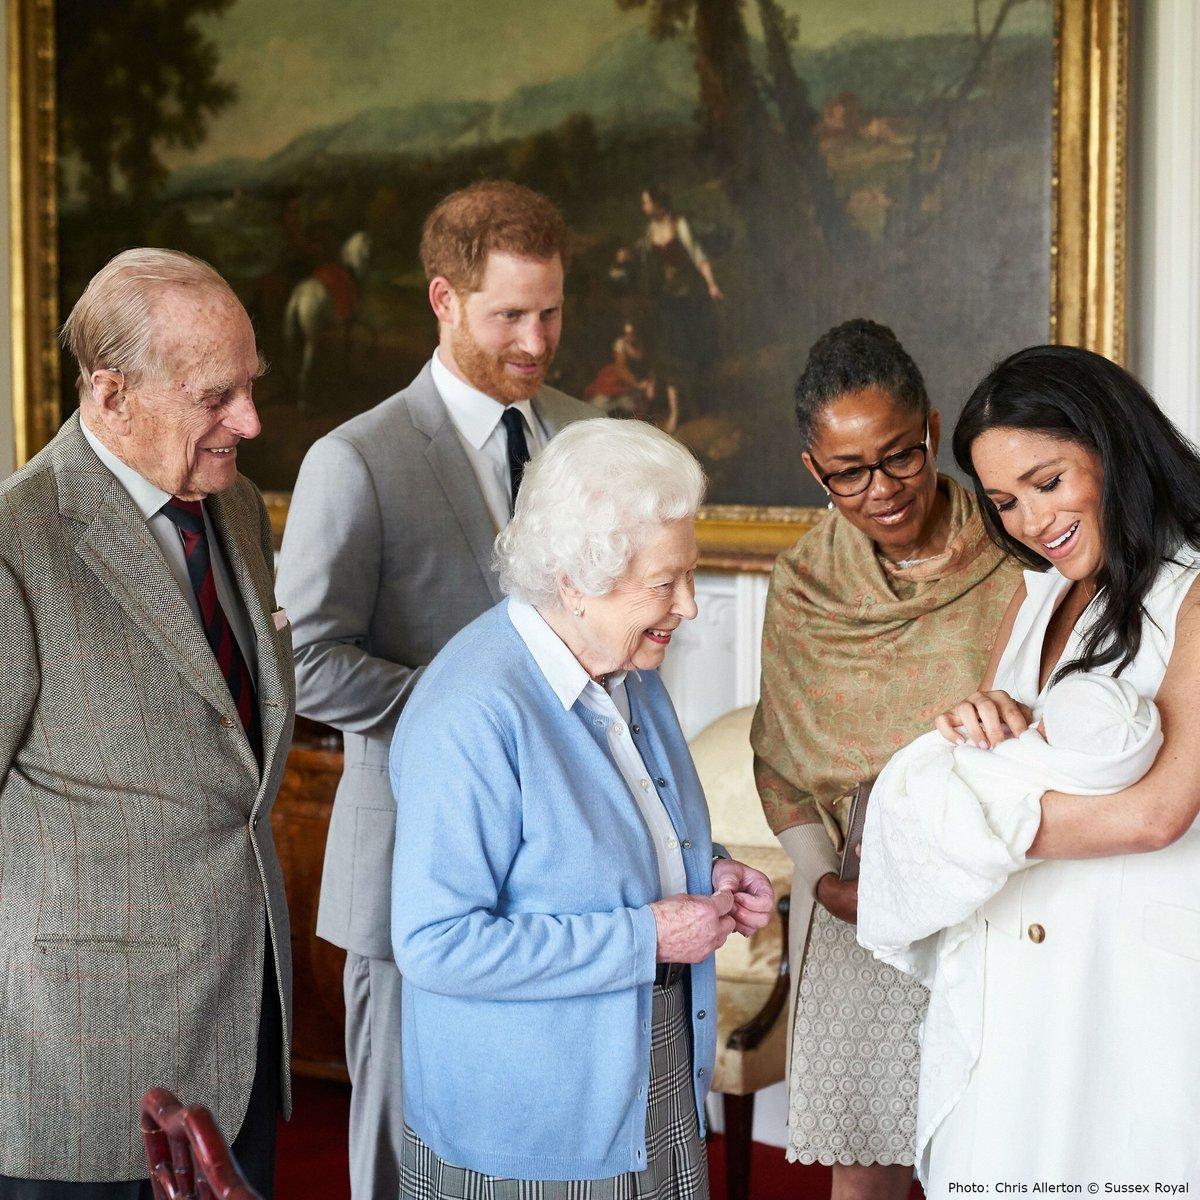 Foto La reina Isabel II conoce a su bisnieto Archie 8 mayo 2019